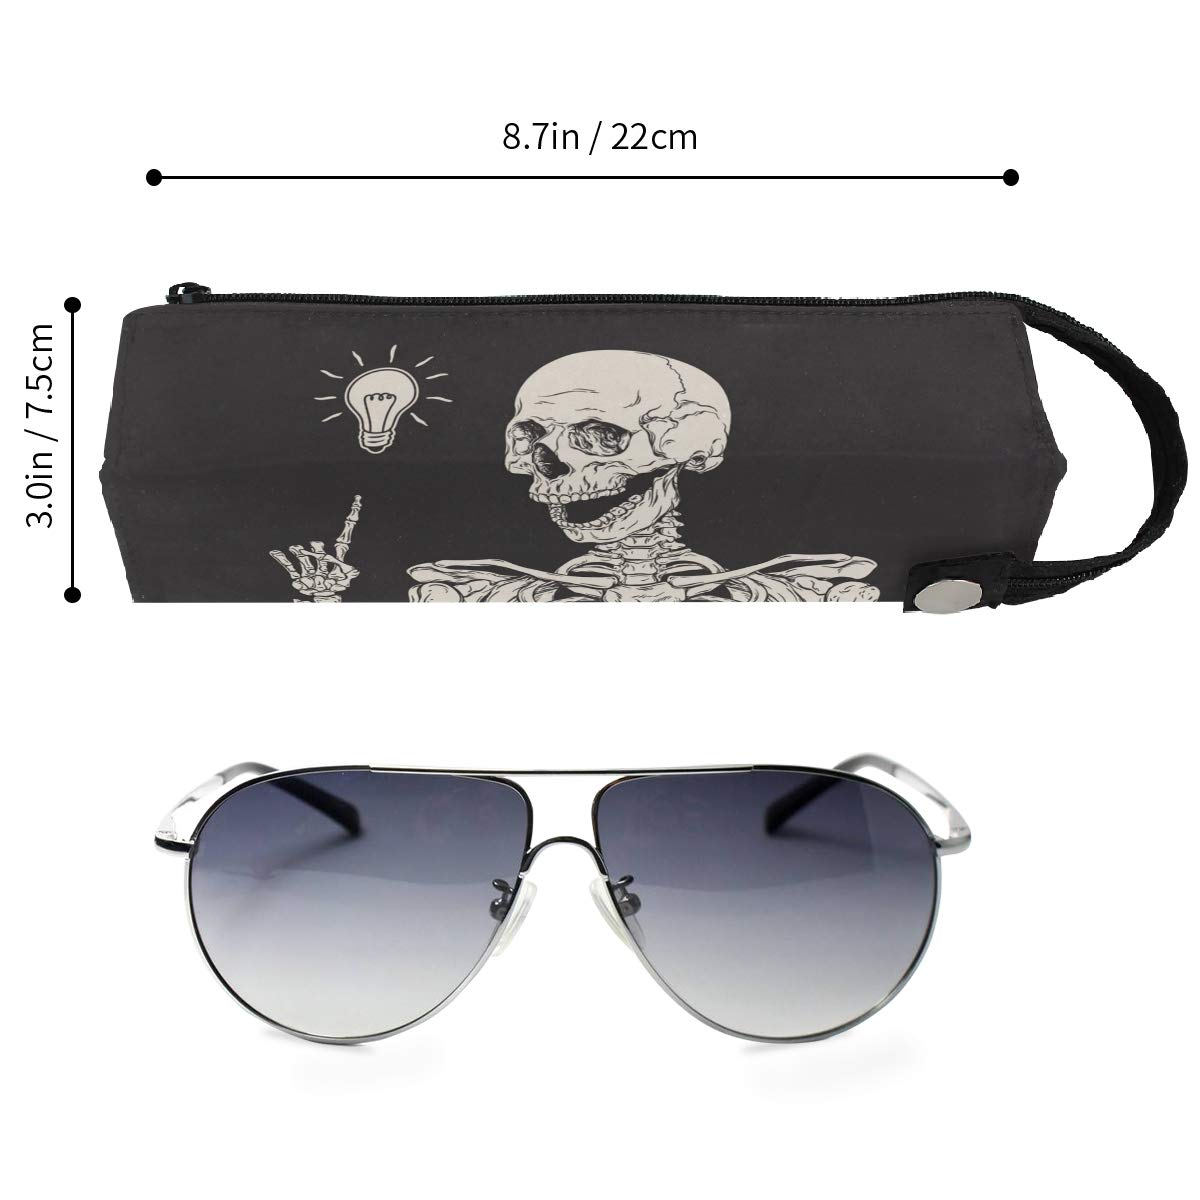 My Little Nest Eyeglass Sunglasses Holder Pouch Bag Skeleton Has An Idea Multi Function Zipper Pen Case Pencil Bag Organizer